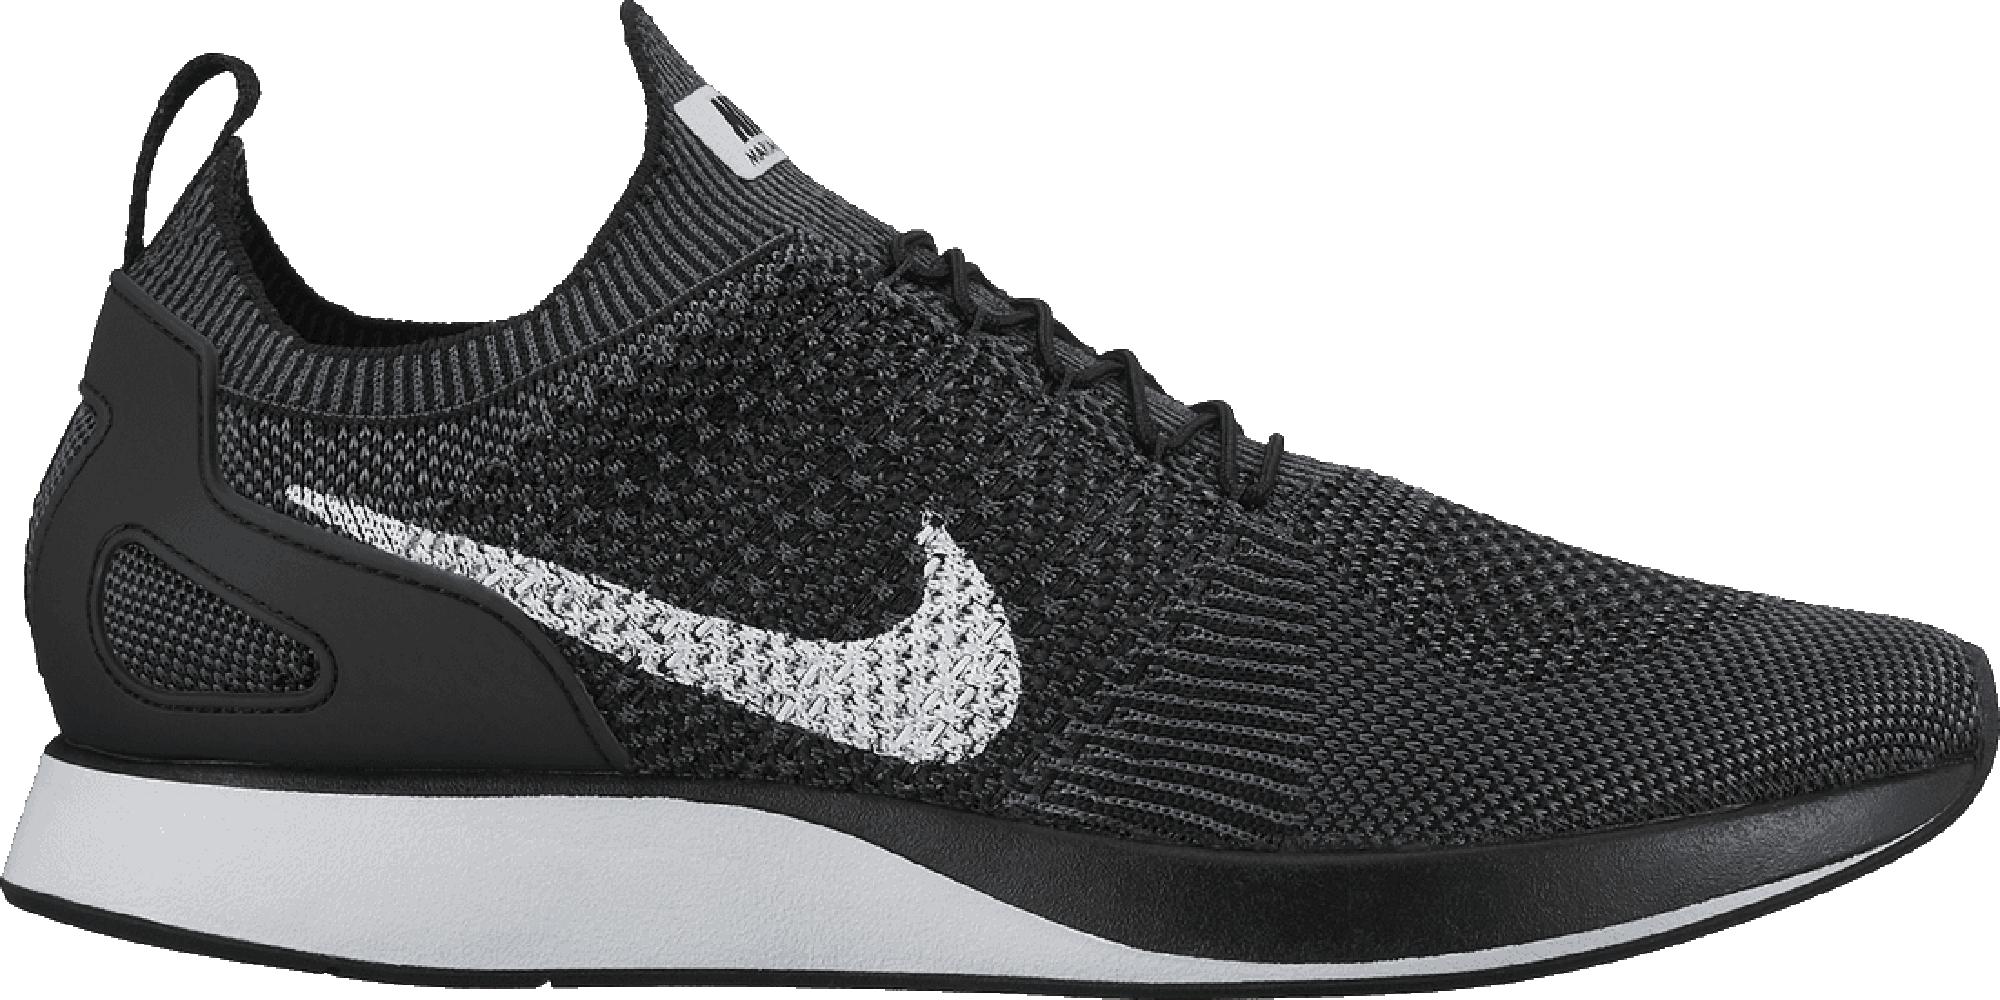 Nike Mariah Flyknit Racer Black White